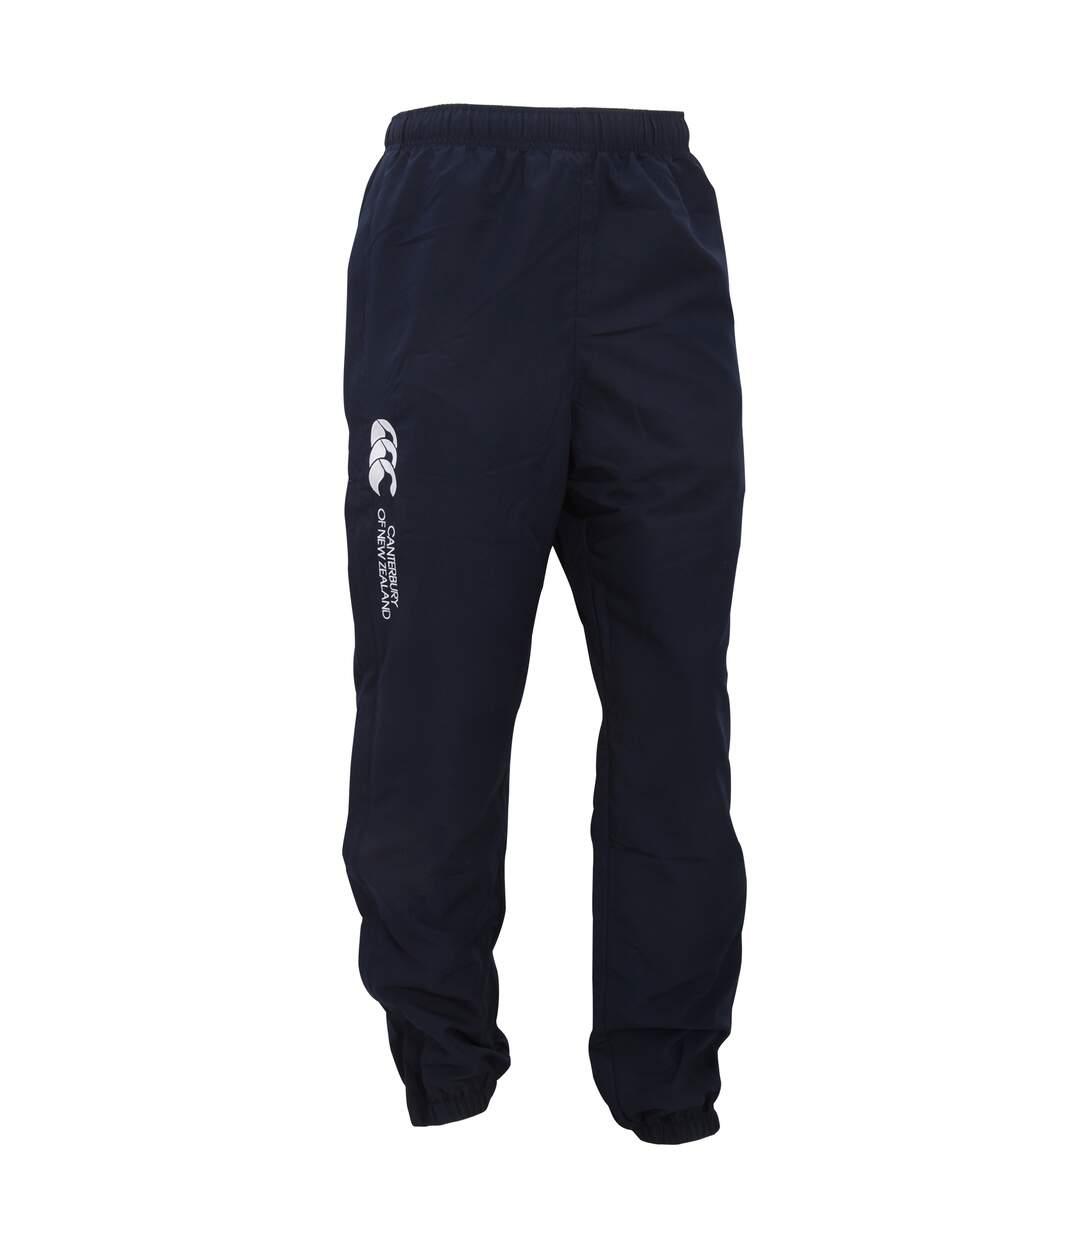 Canterbury Mens Stadium Cuffed Elasticated Sports Trousers (Navy) - UTPC2491